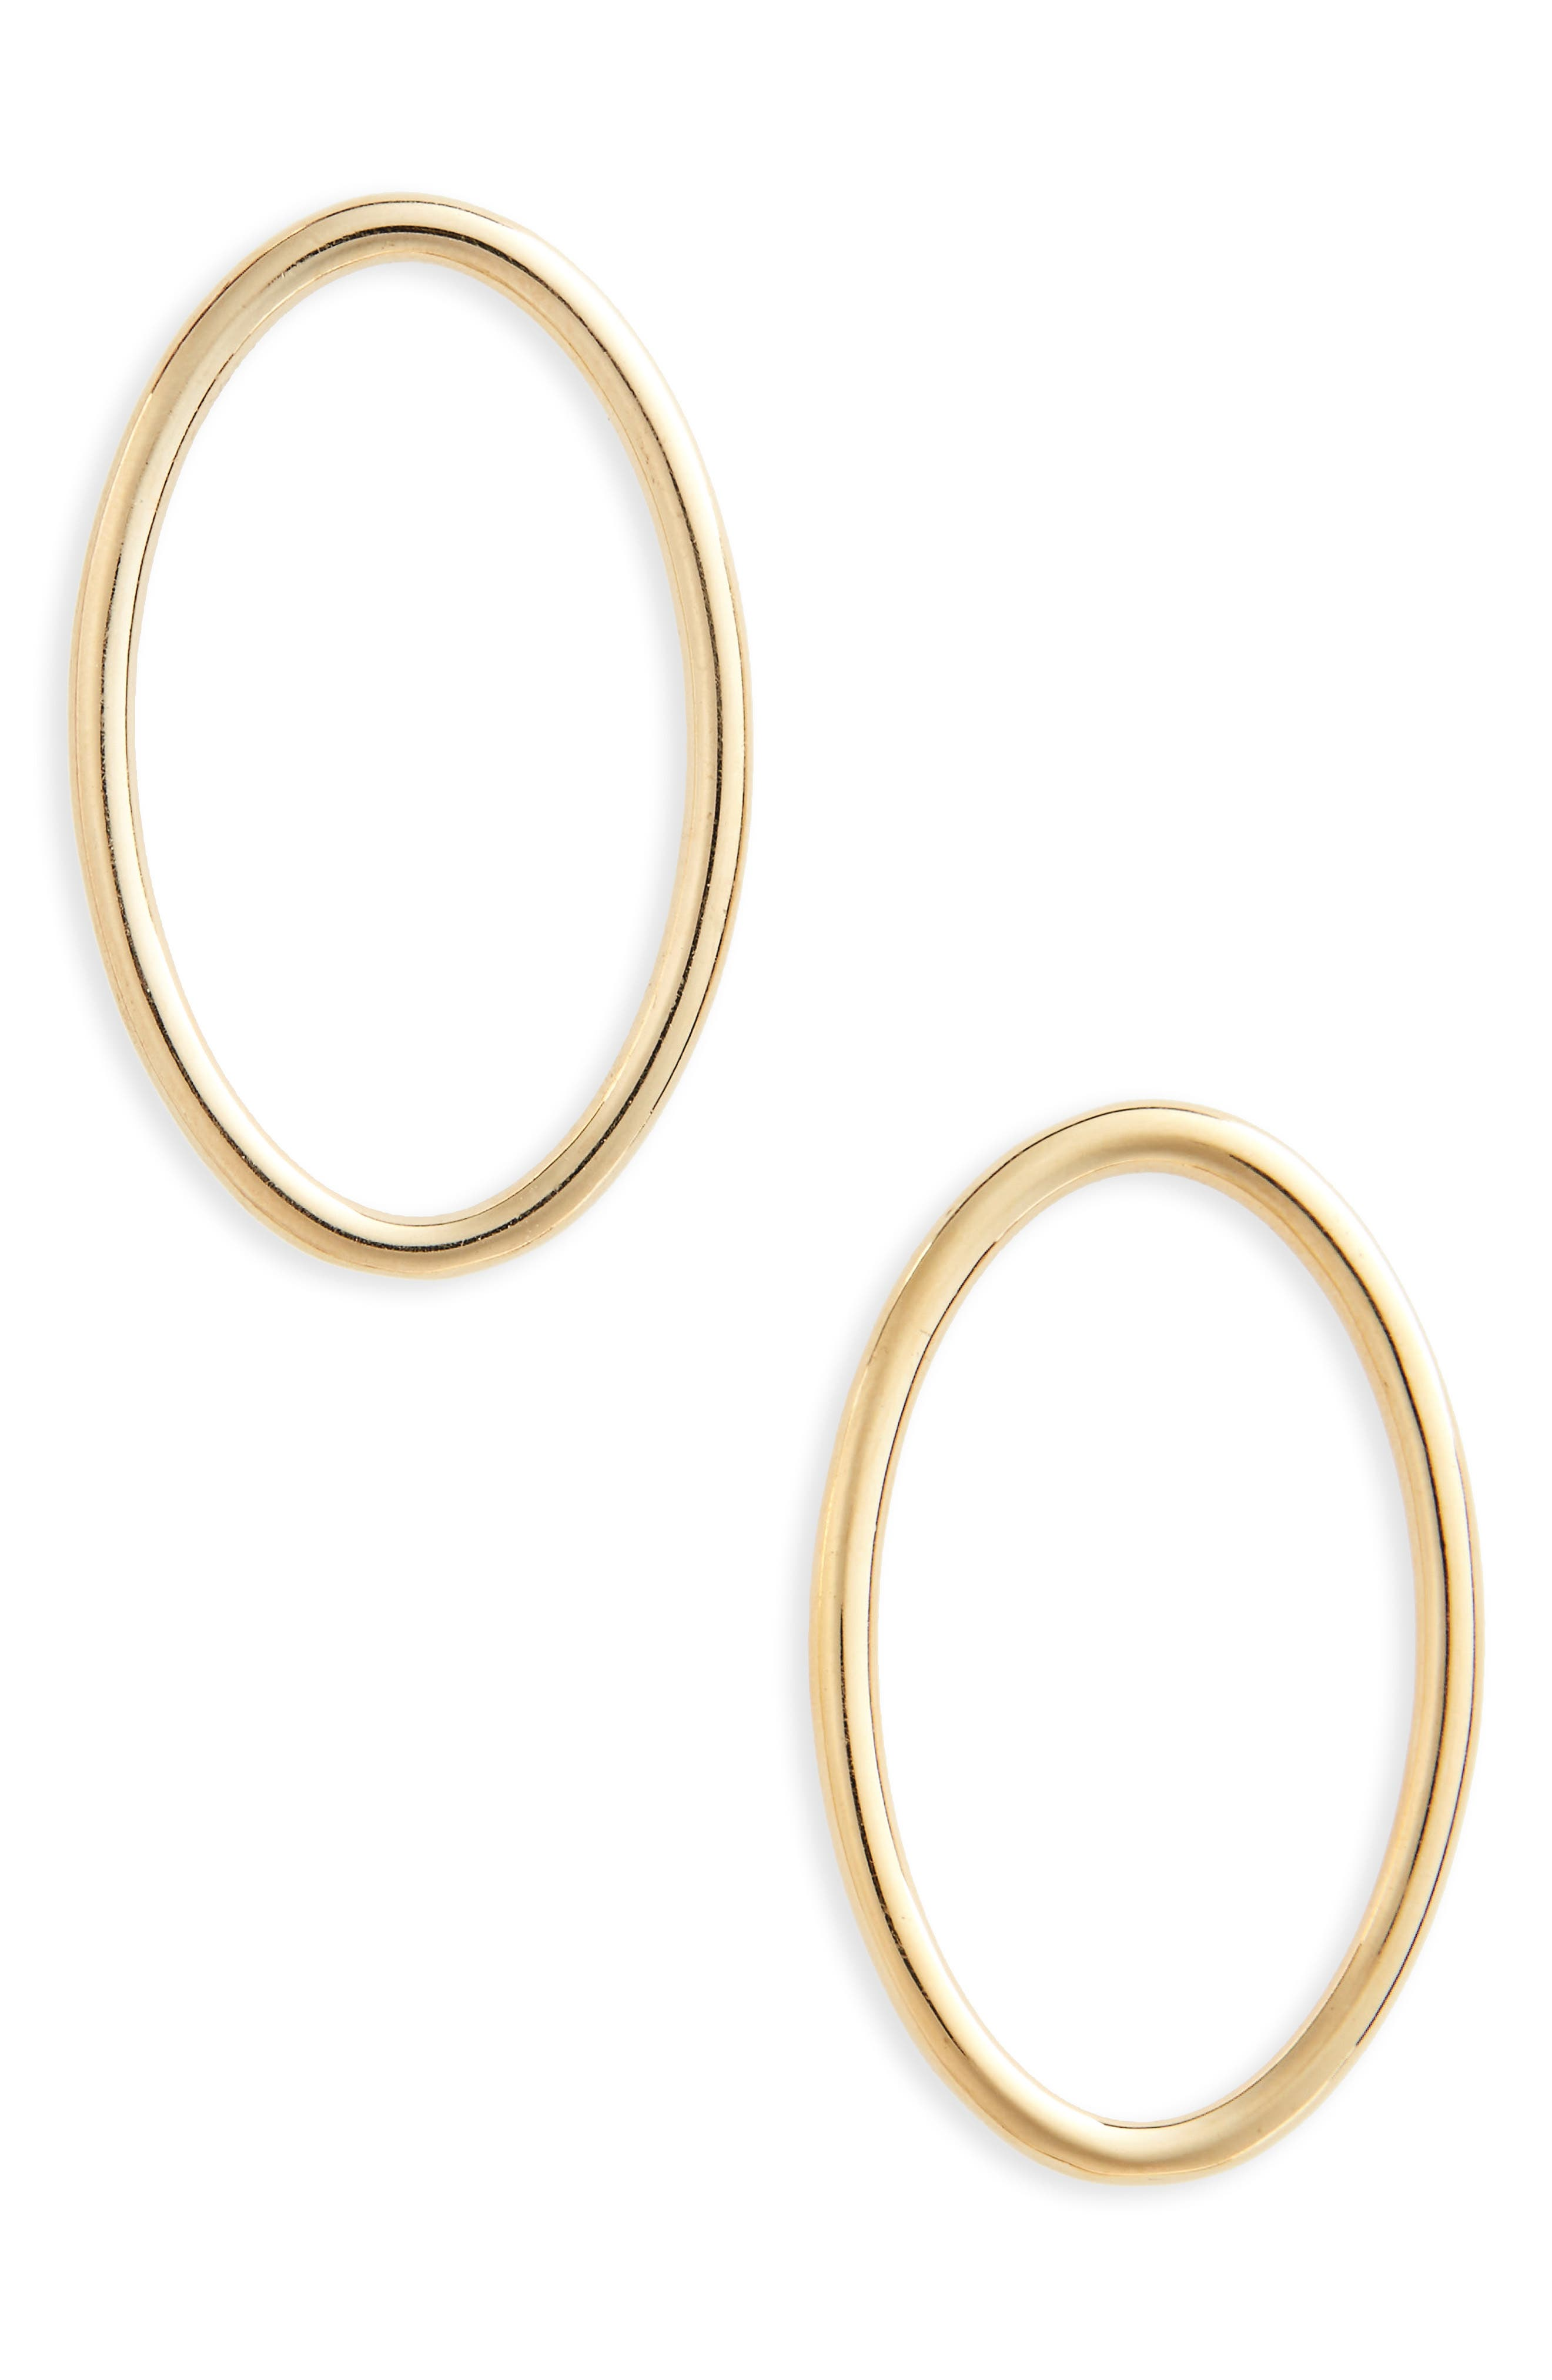 Alternate Image 1 Selected - All Blues Large Ellipse Polished Vermeil Earrings